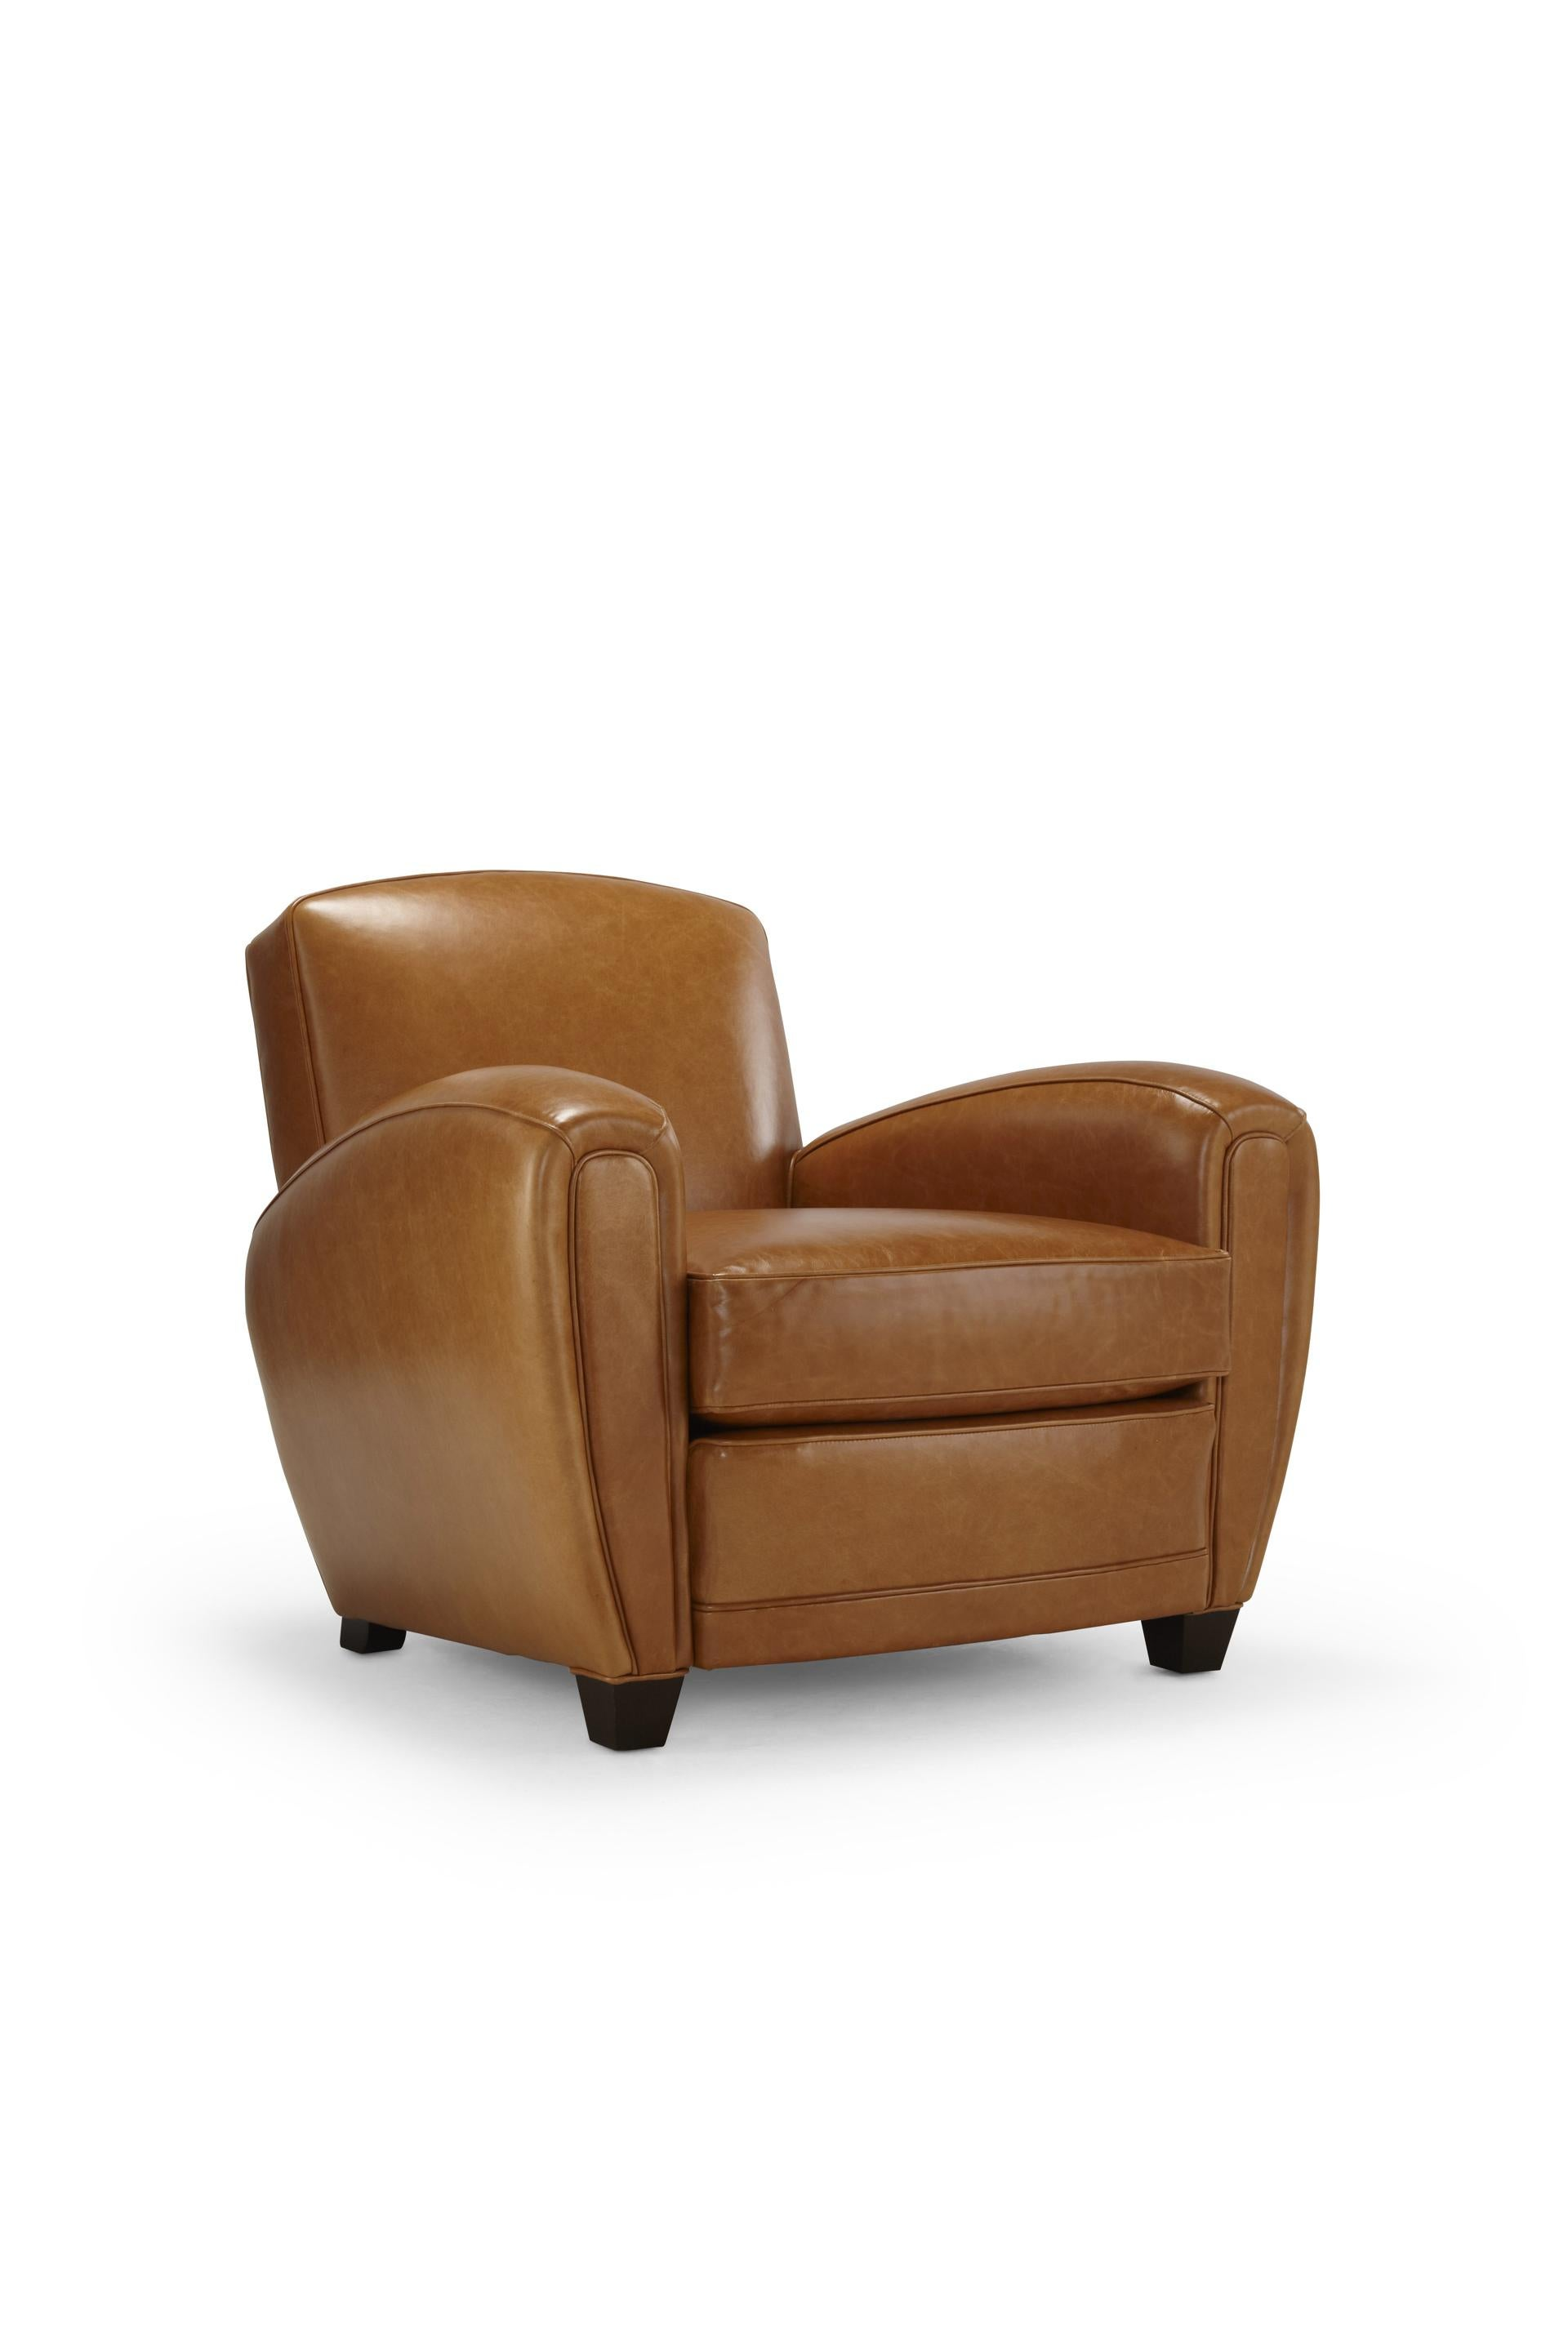 Wills Leather Chair 2924 At Mitchell Gold Bob Williams 142 Berkeley St Boston 617 266 0075 Mgbw